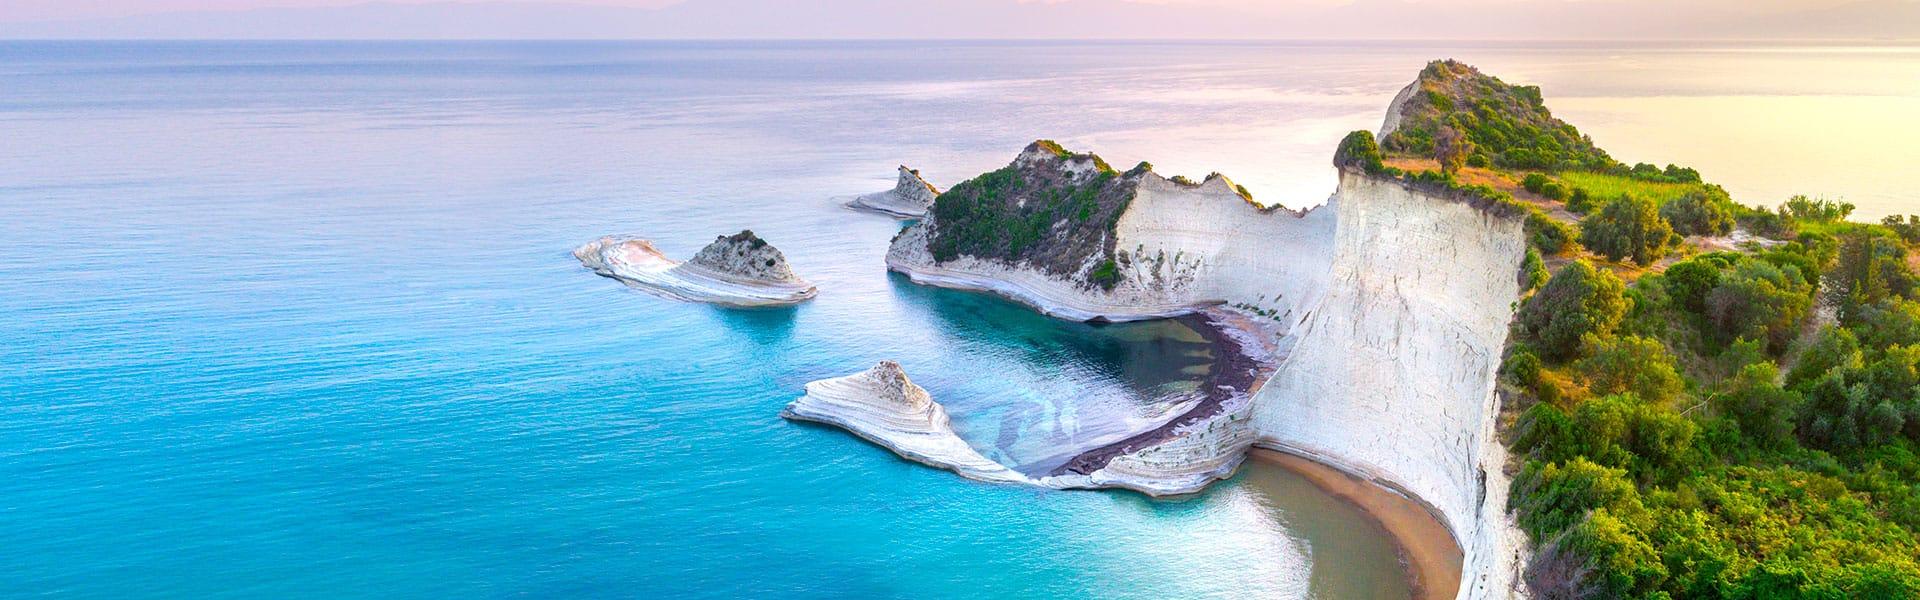 Islas griegas:Santorini, Atenas yCroacia